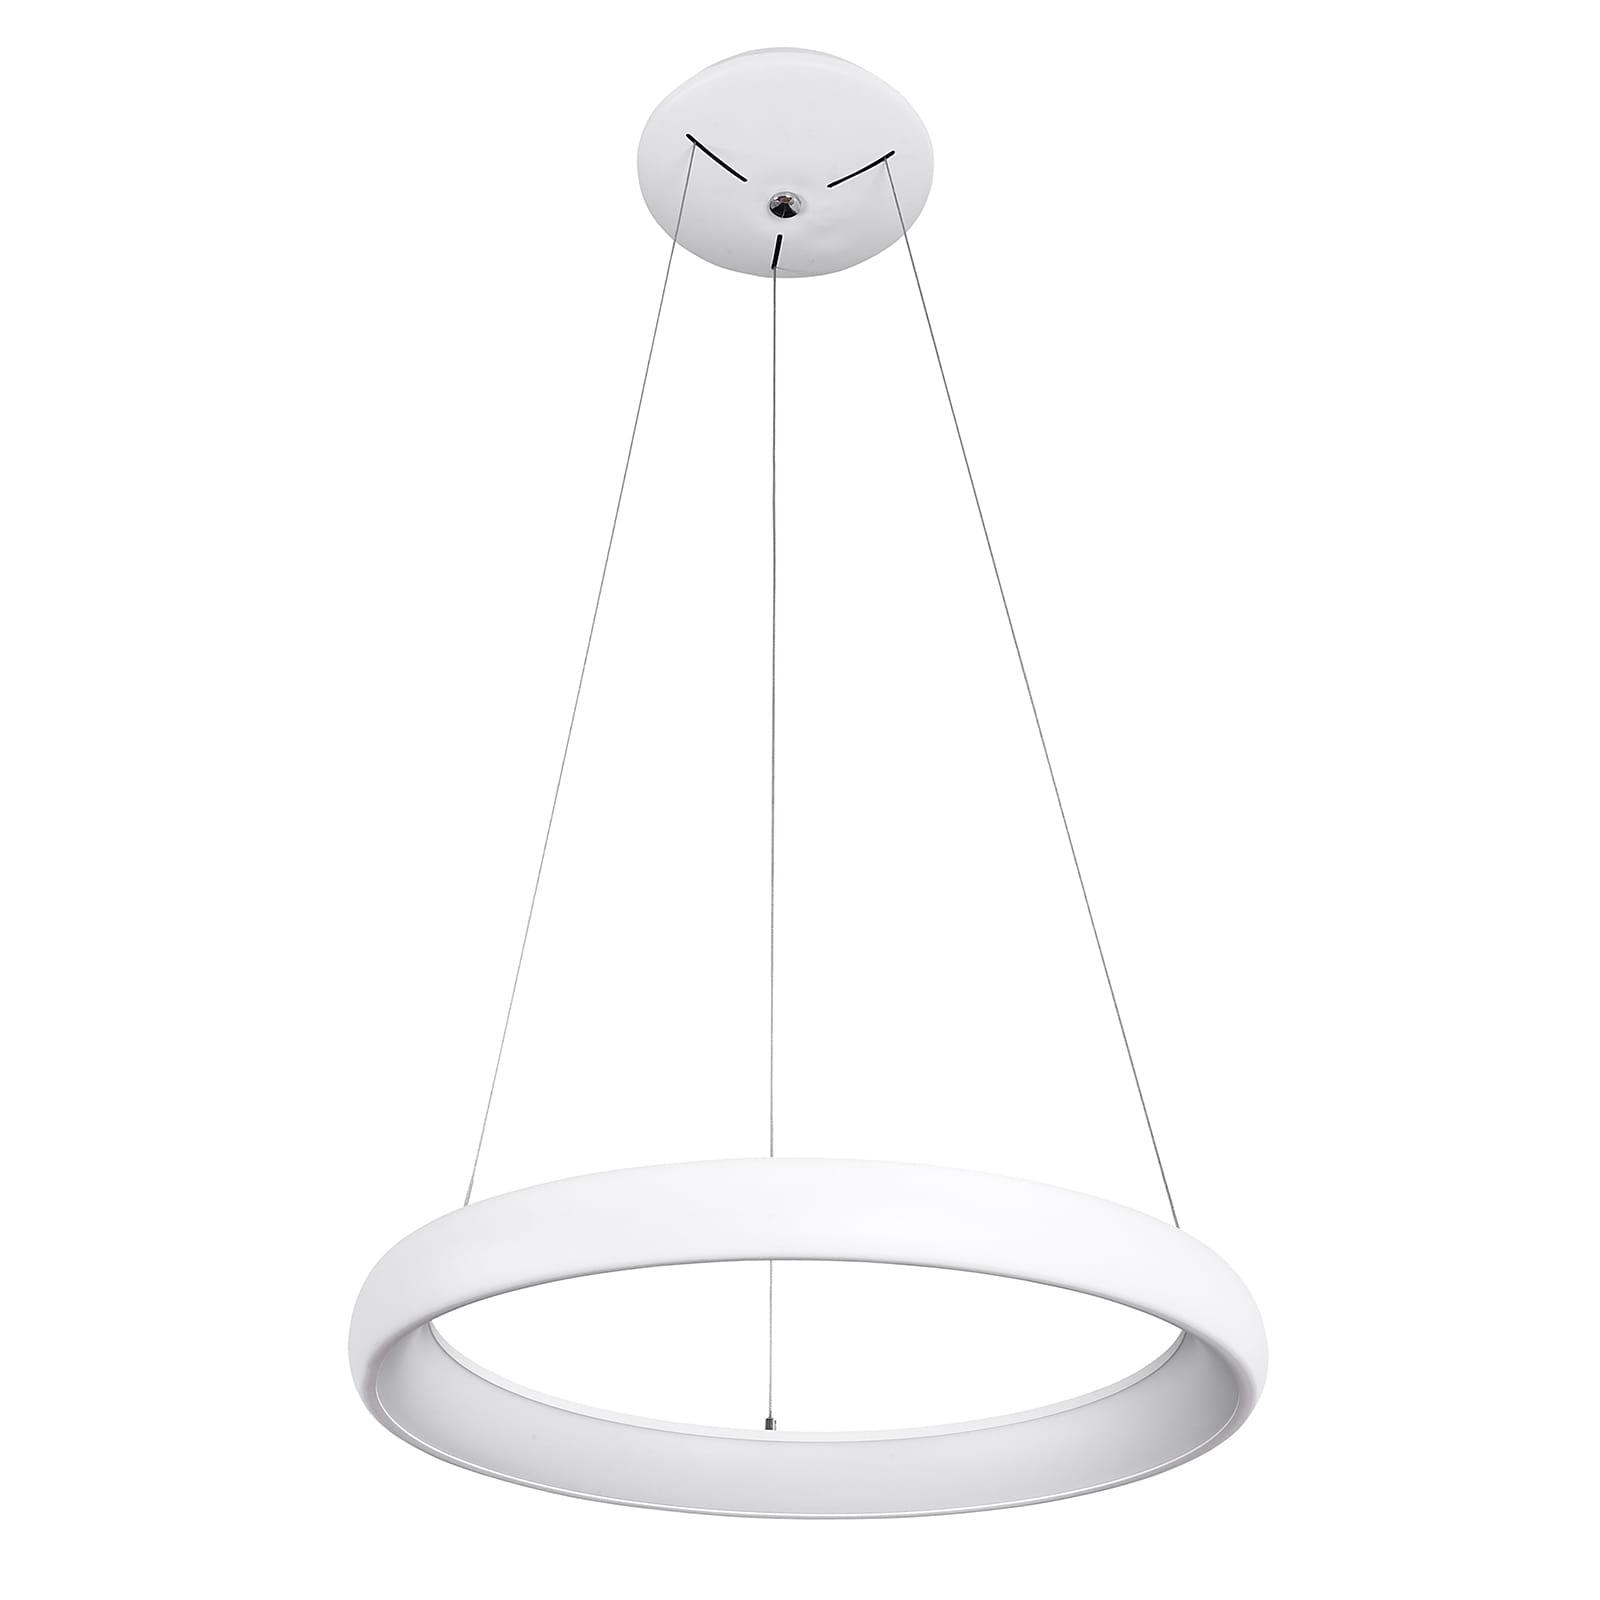 Lampa Sufitowa Alessia 40w Led Biala 5280 840rp Wh 3